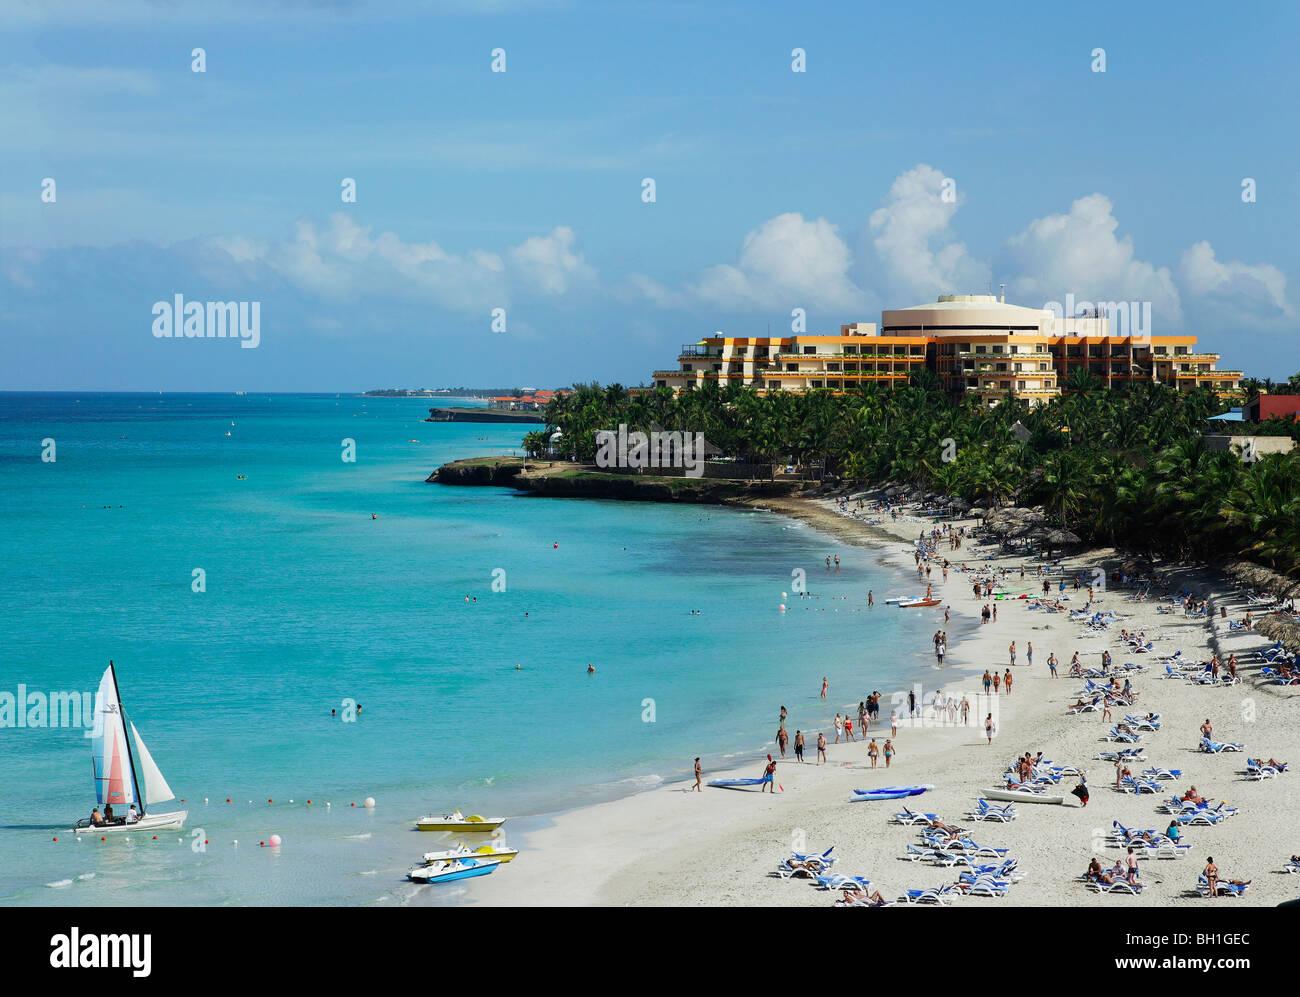 Hotel Melia Varadero 5 (KubaVaradero): overview, description and reviews of tourists 66